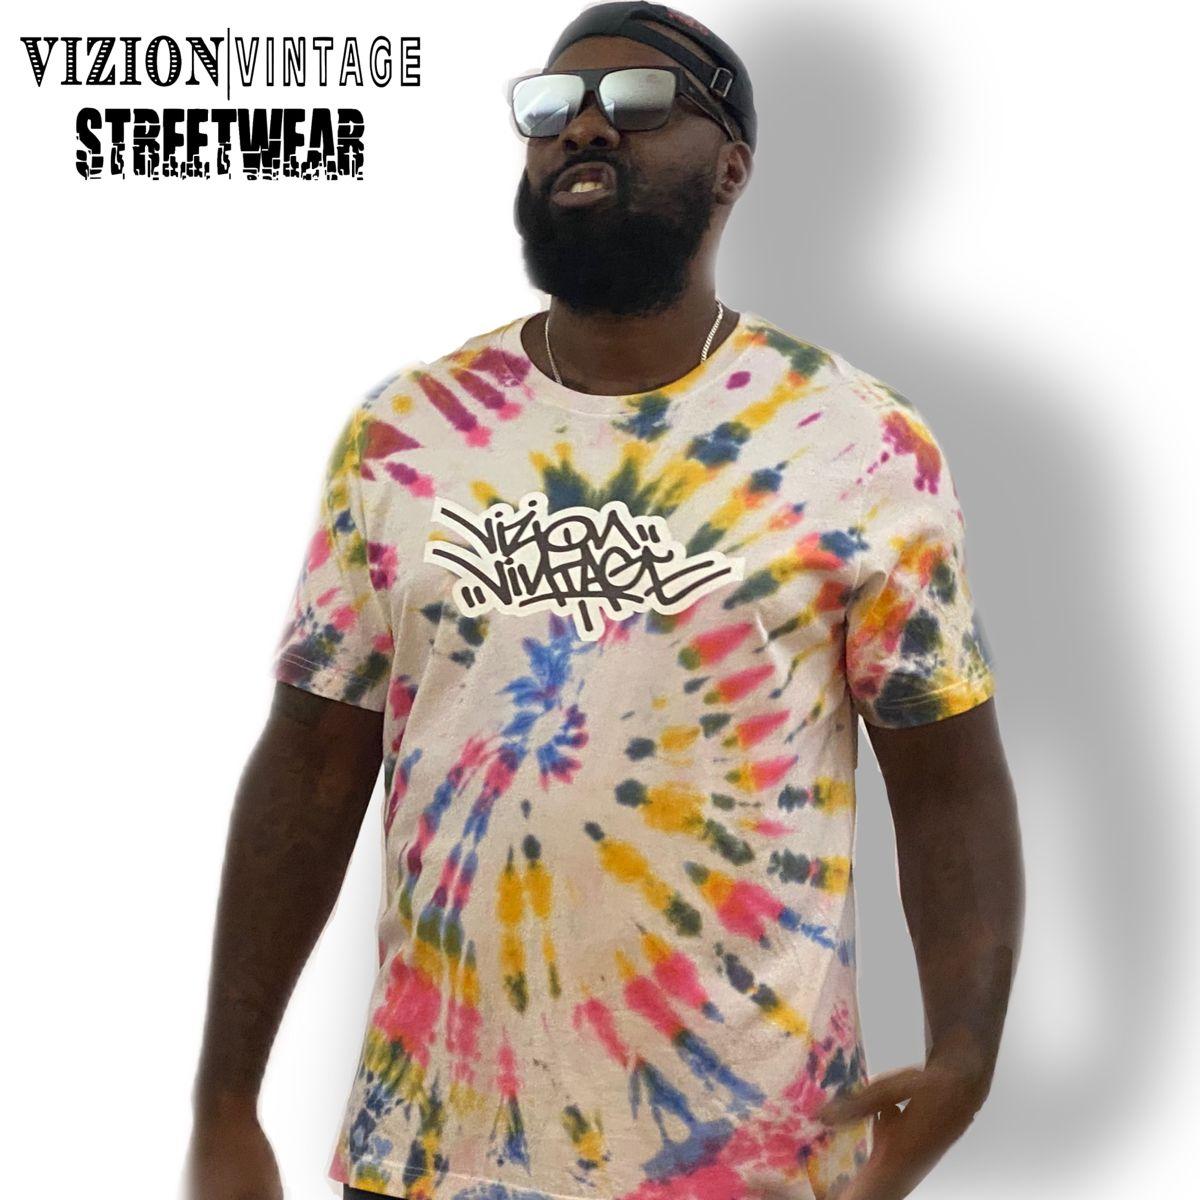 Vizion Vintage Street Wear Tie Dye T Shirts Clothing Brand Street Wear [ 1200 x 1200 Pixel ]